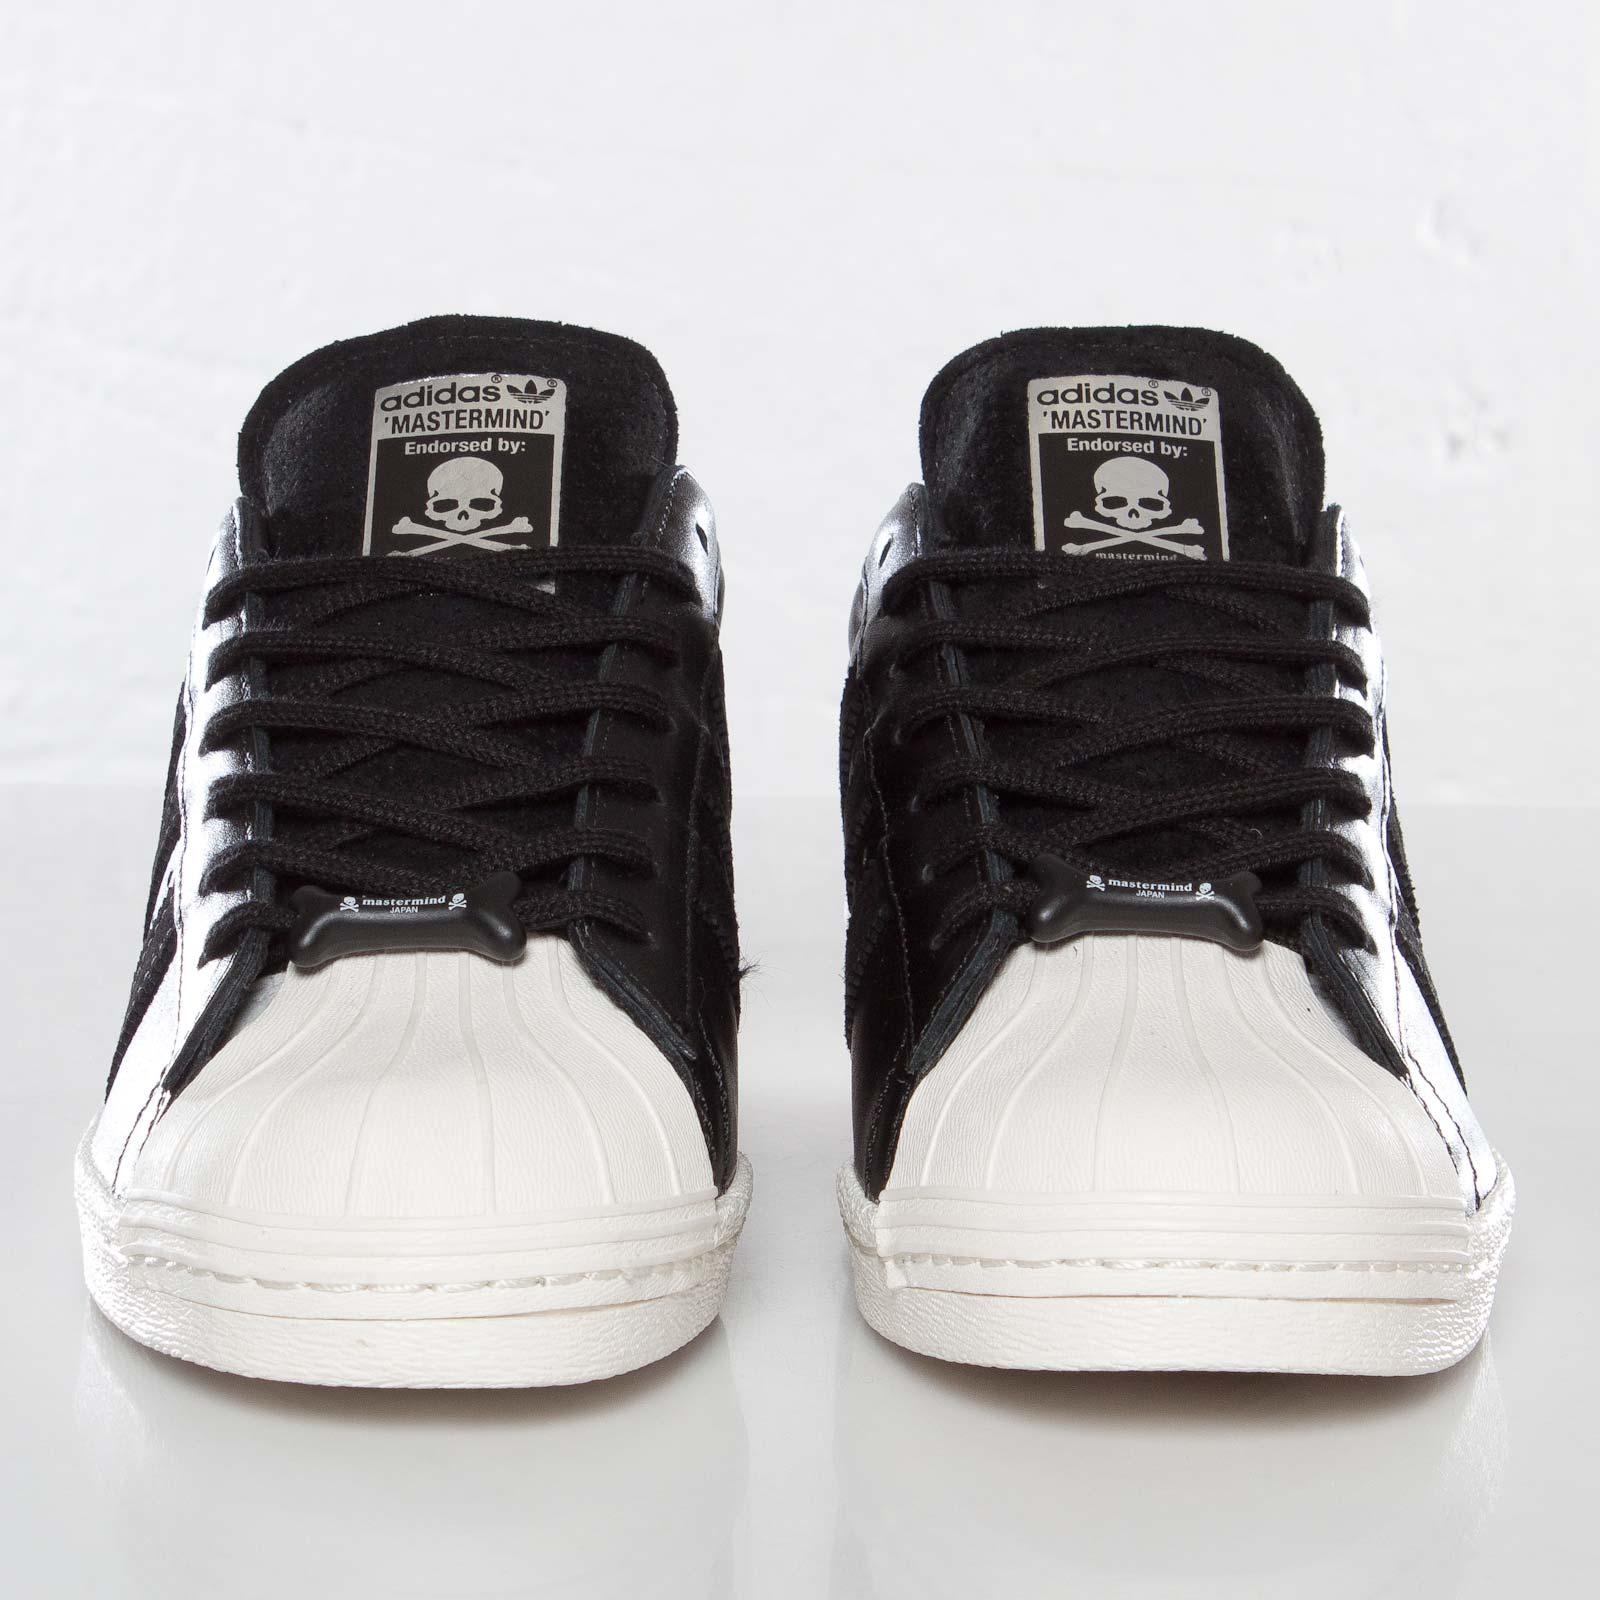 on sale 547d1 fe99a adidas Superstar 80s - mastermind adidas Superstar 80s - mastermind ...